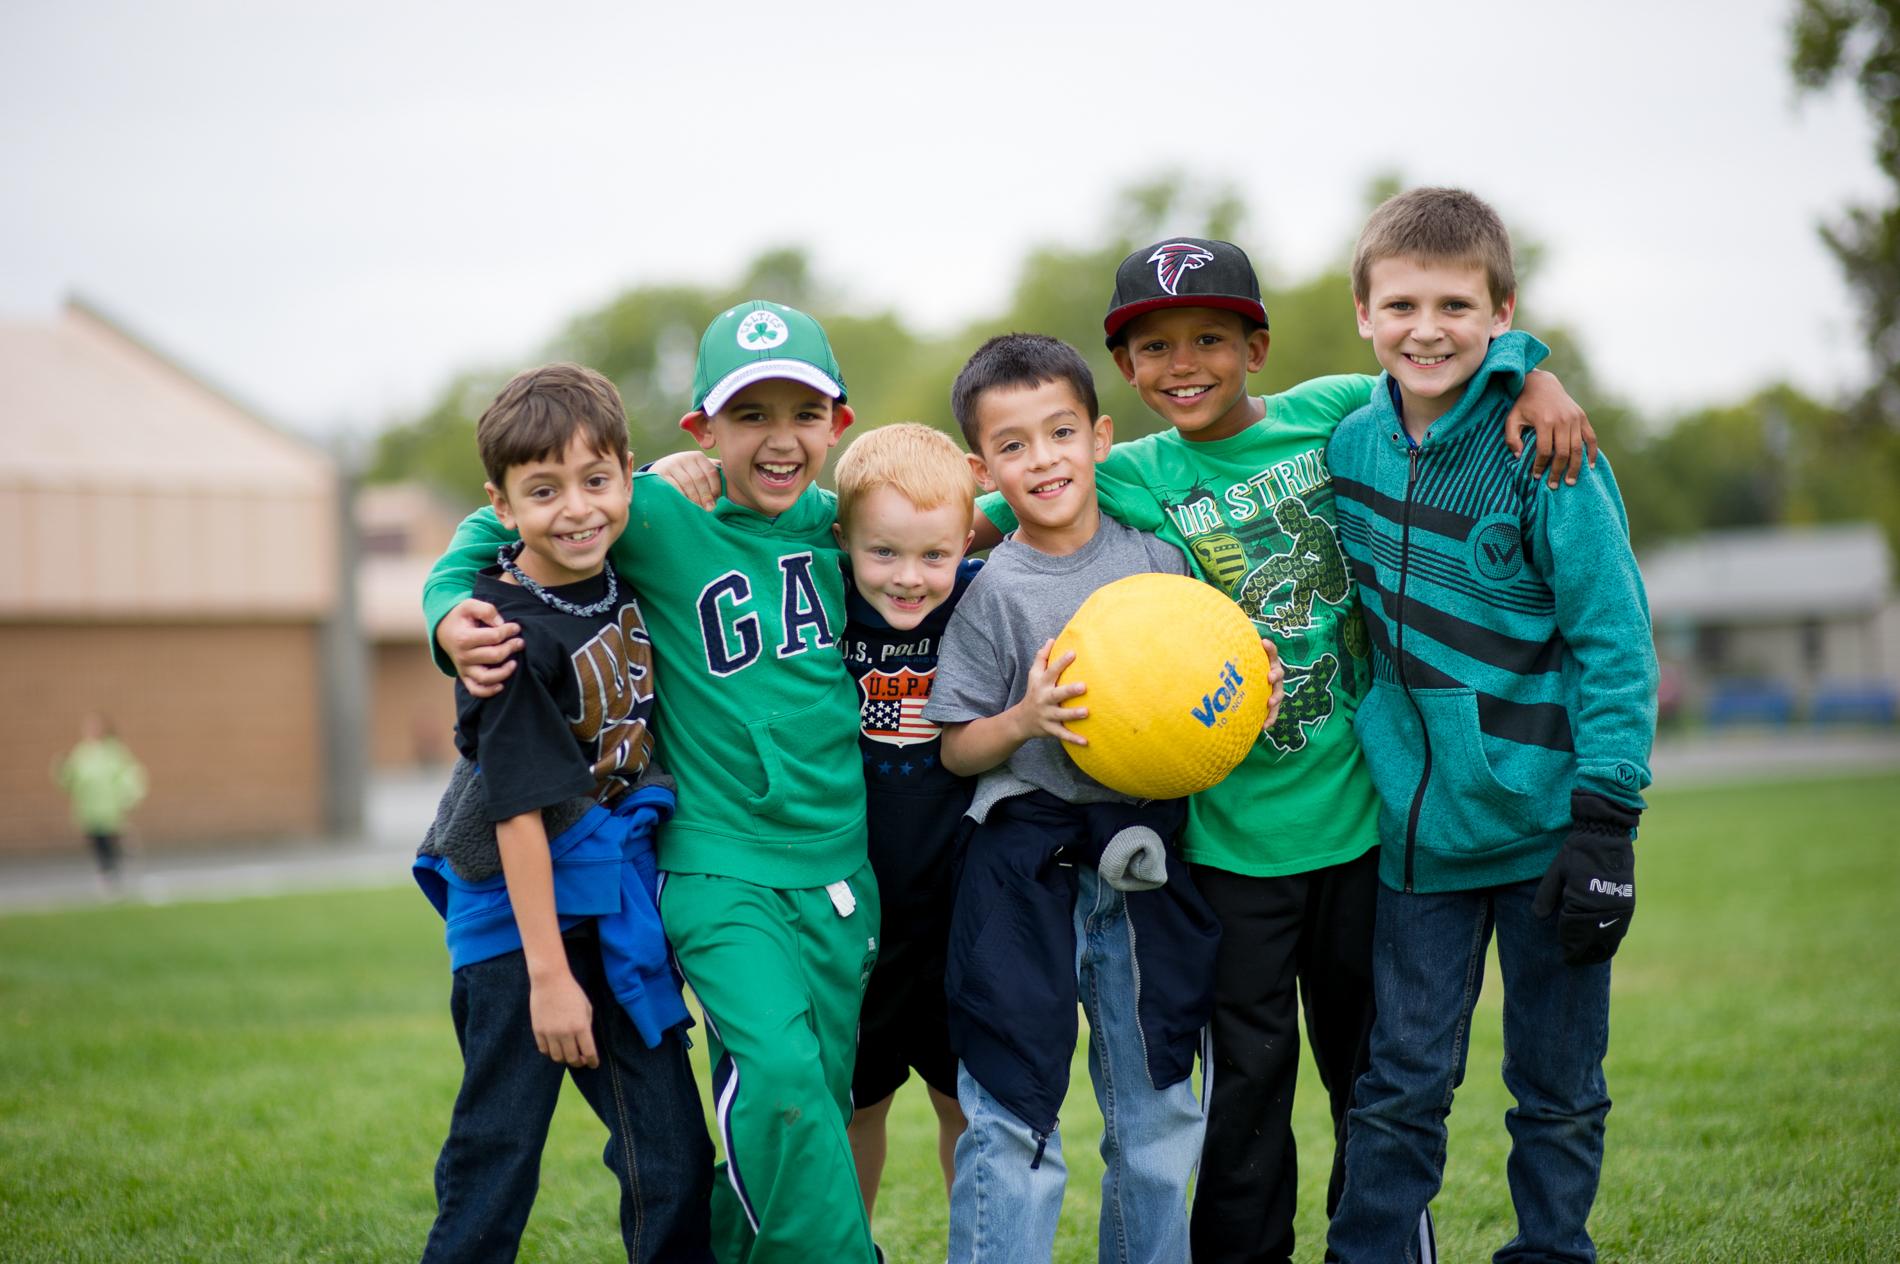 Boys on a Playground